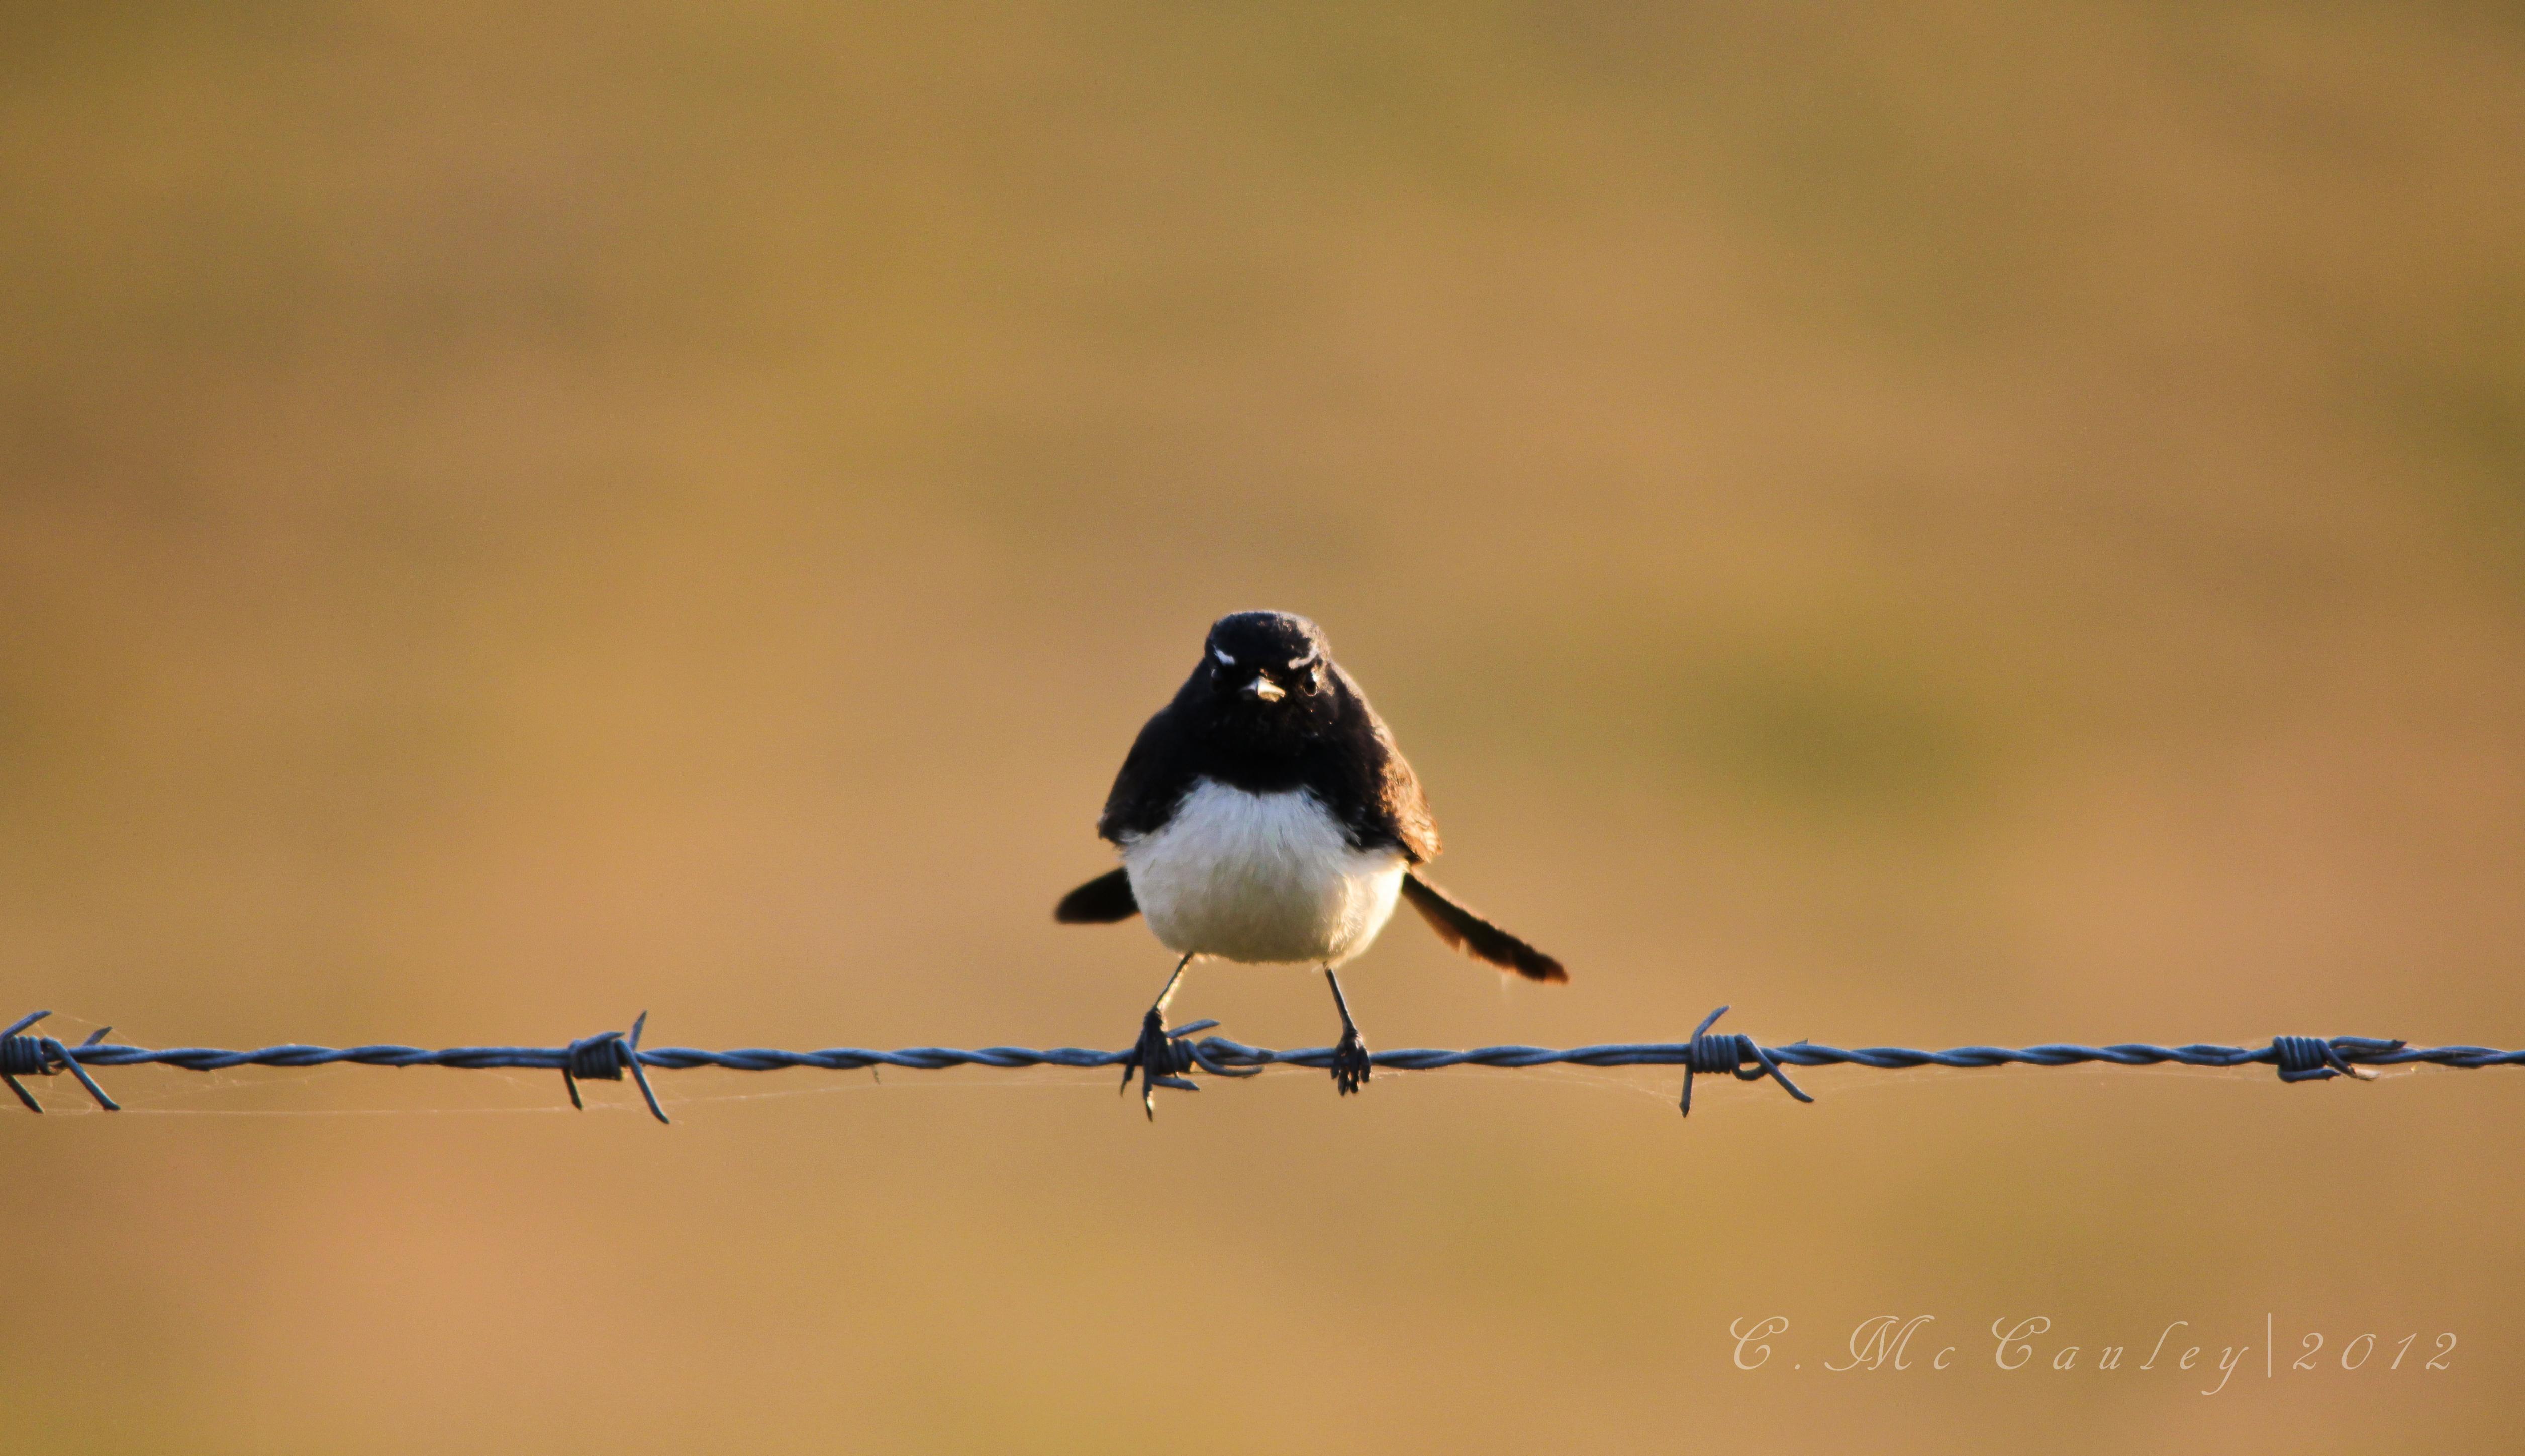 Day 247 – Bird on A Wire | cindymccauley